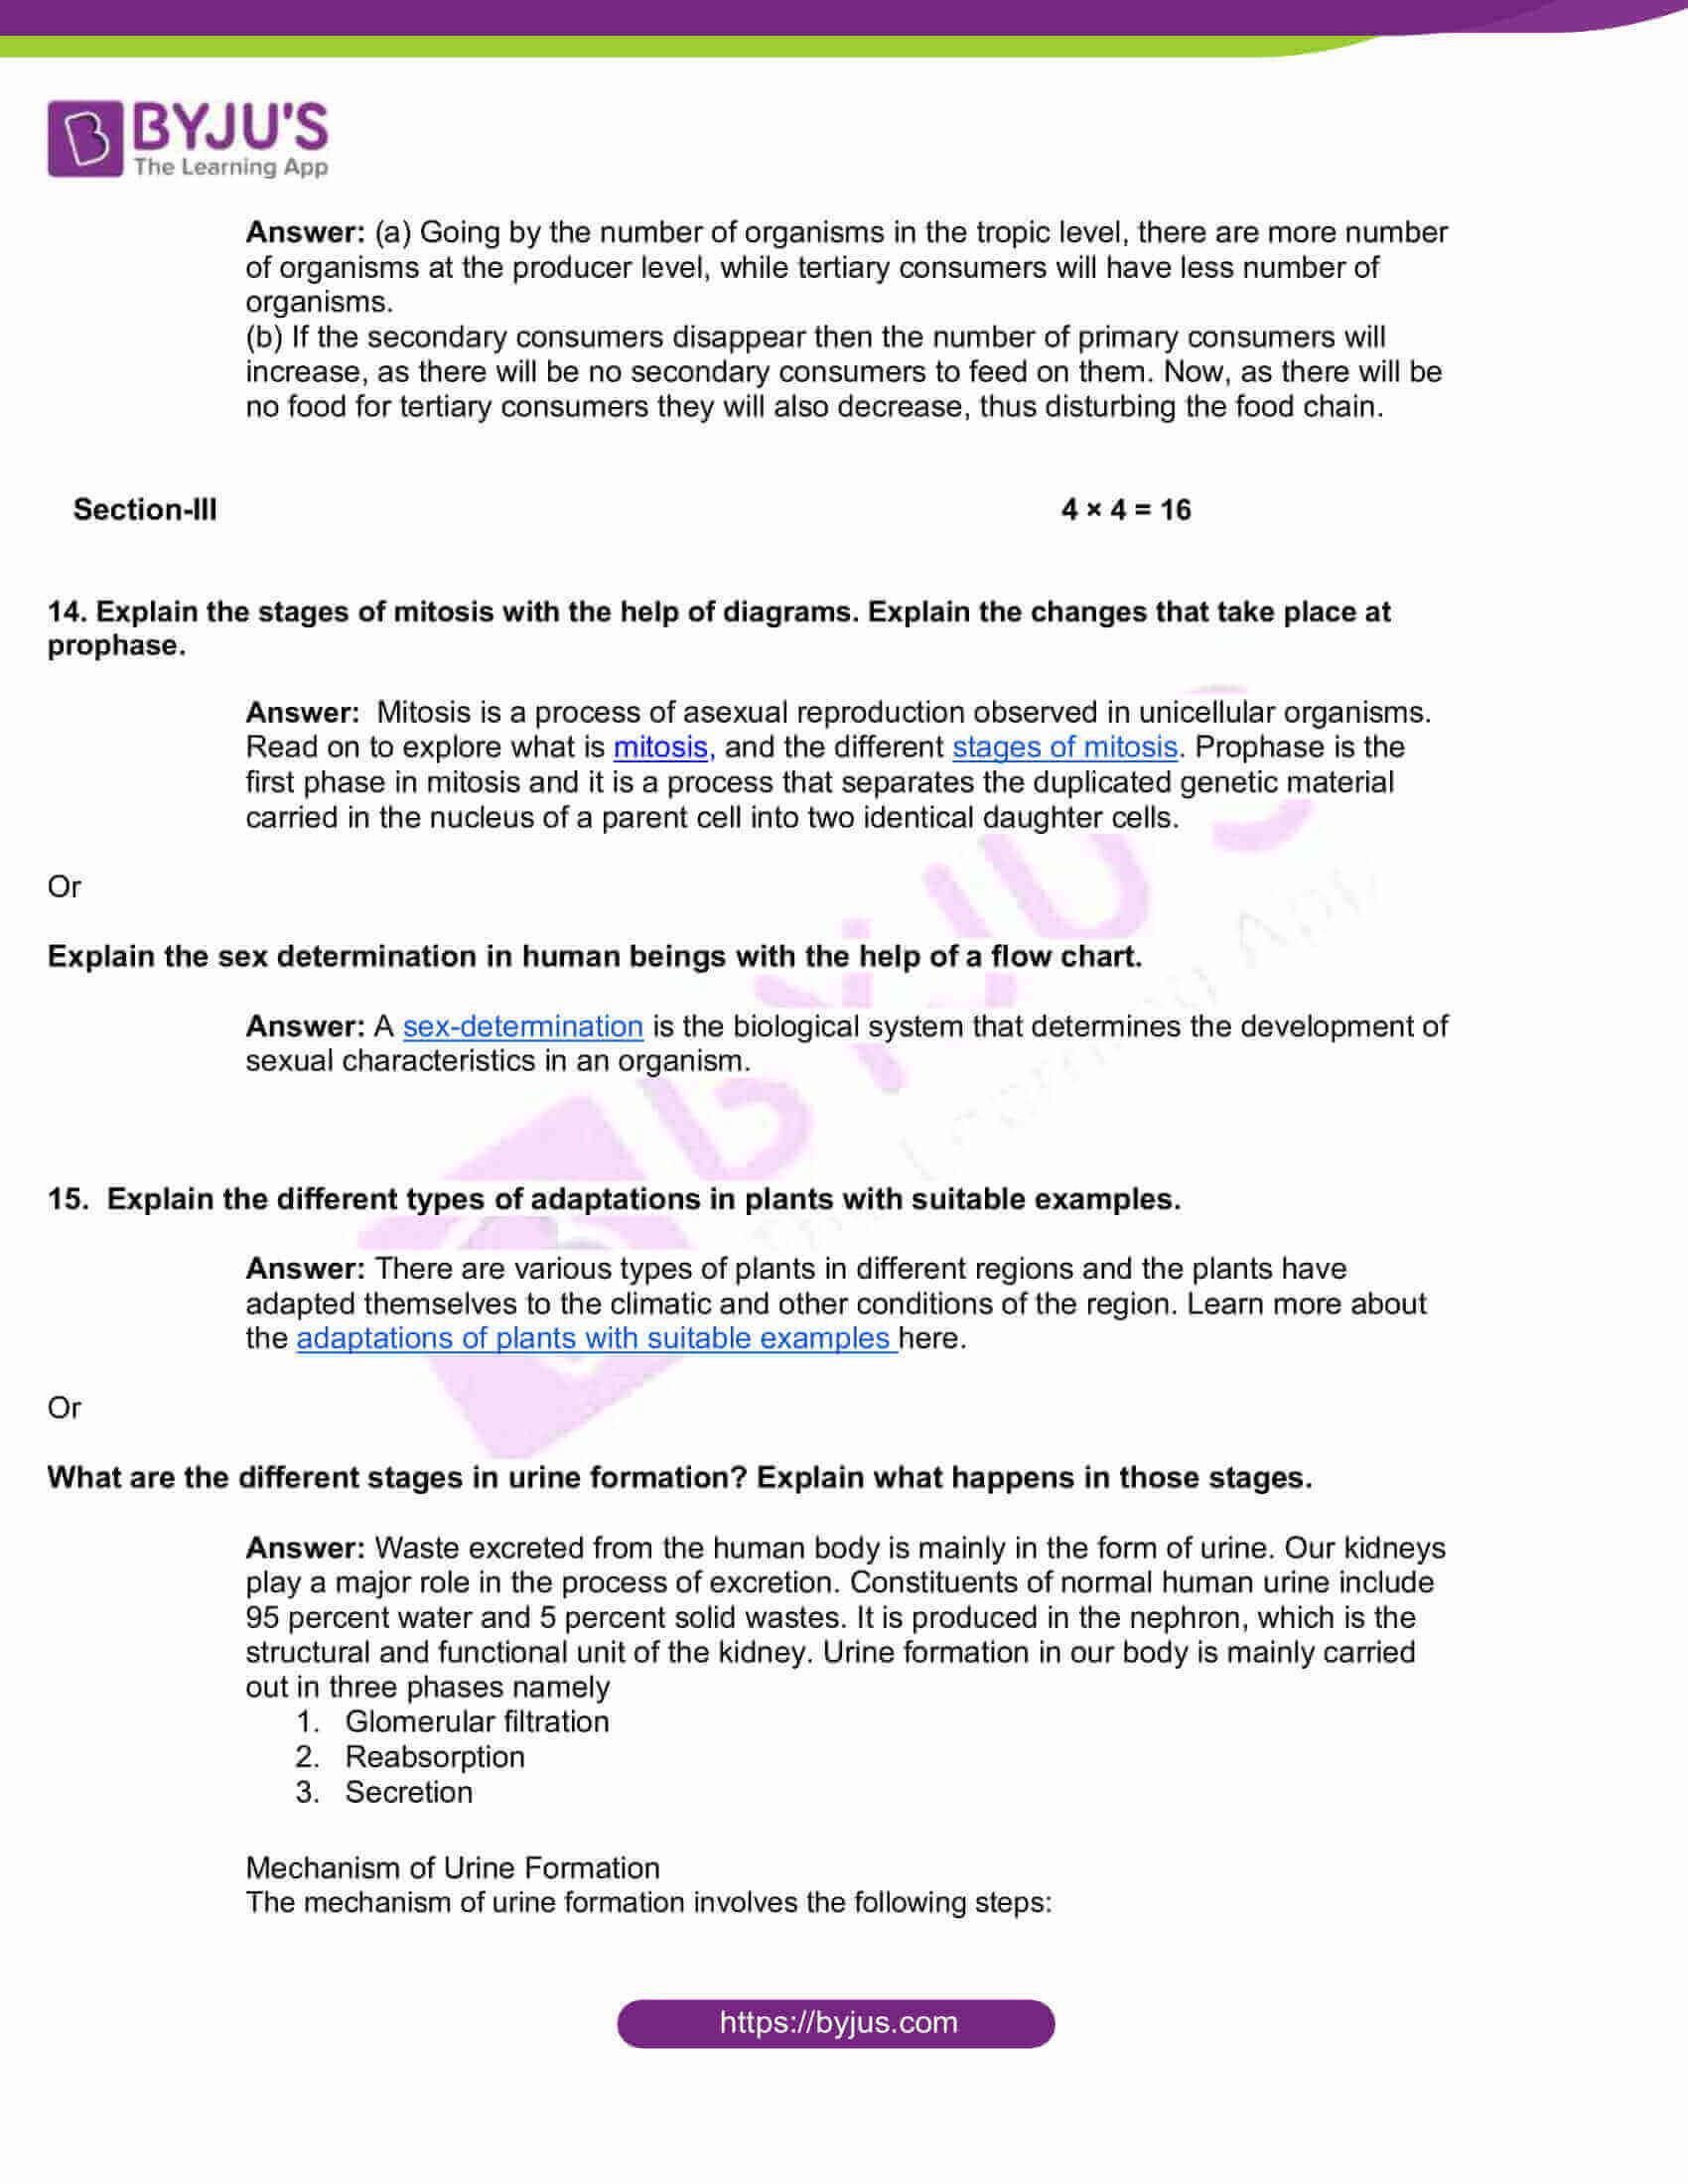 telangana board nov2020 class 10 science part ii solutions 2016 4